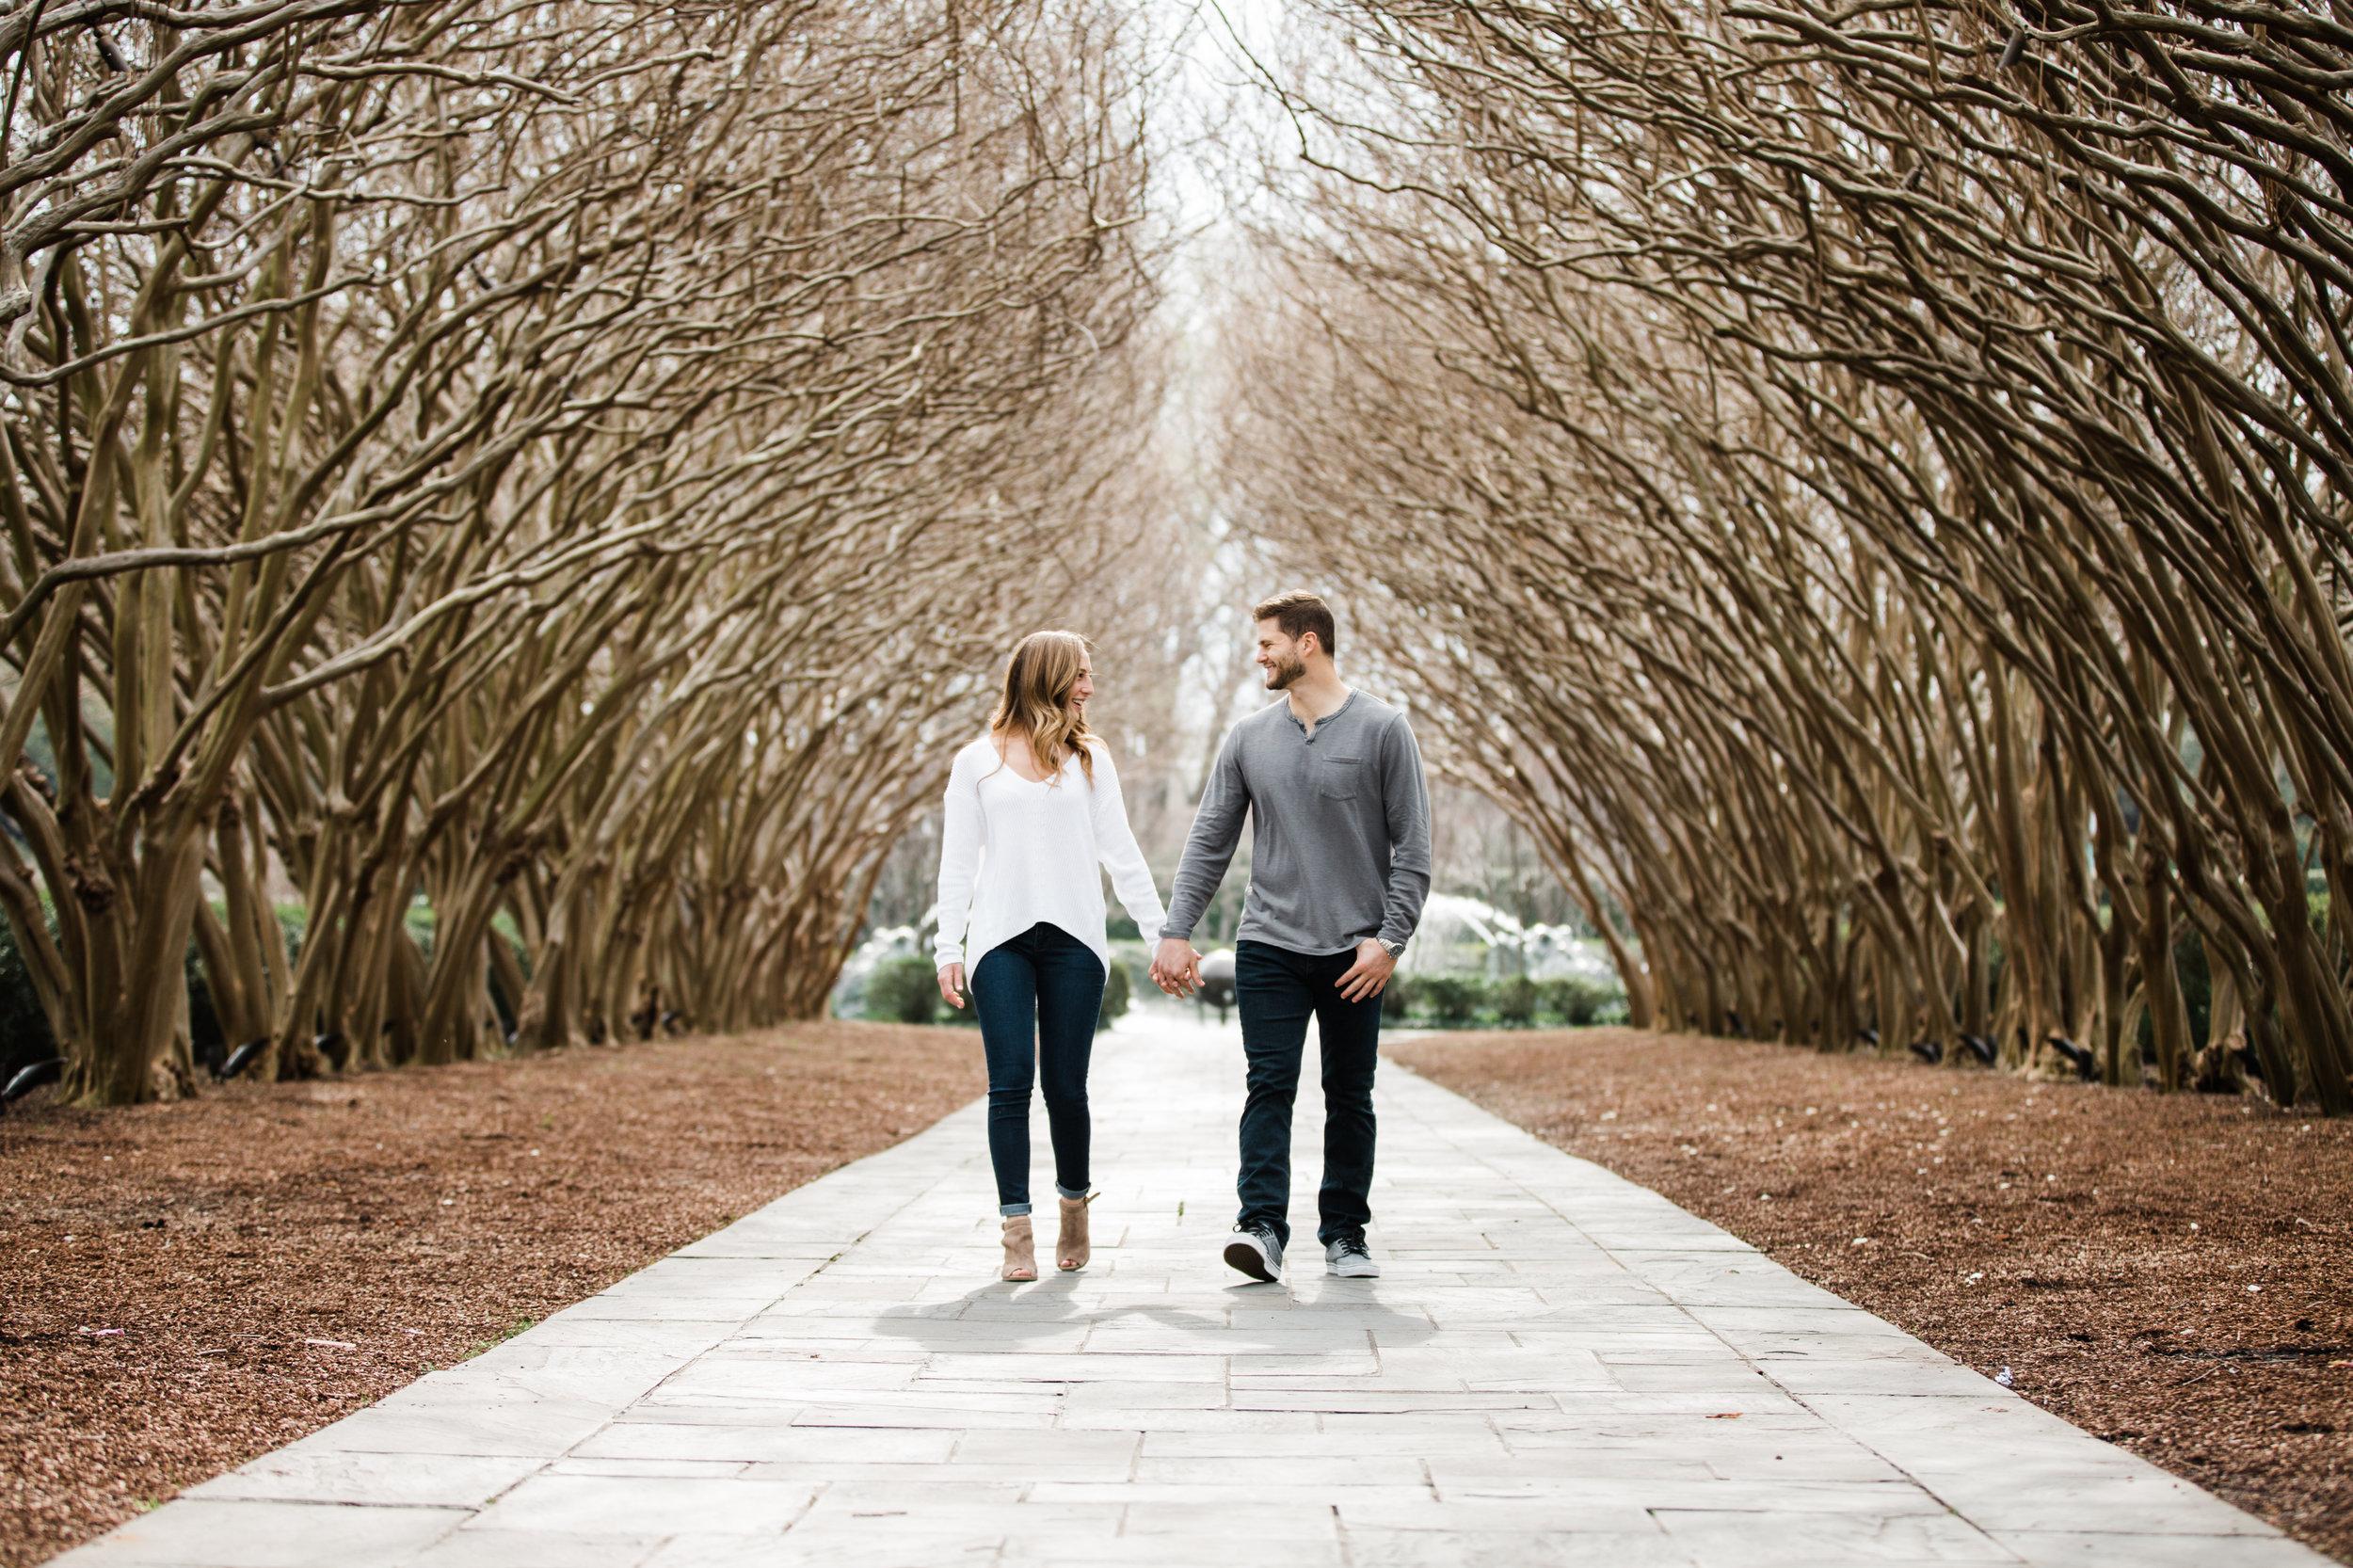 Dallas-Texas-Engagement-Session-Dallas-Arboretum-L.A.R.Weddings-Lindsey-Ramdin-25.jpg